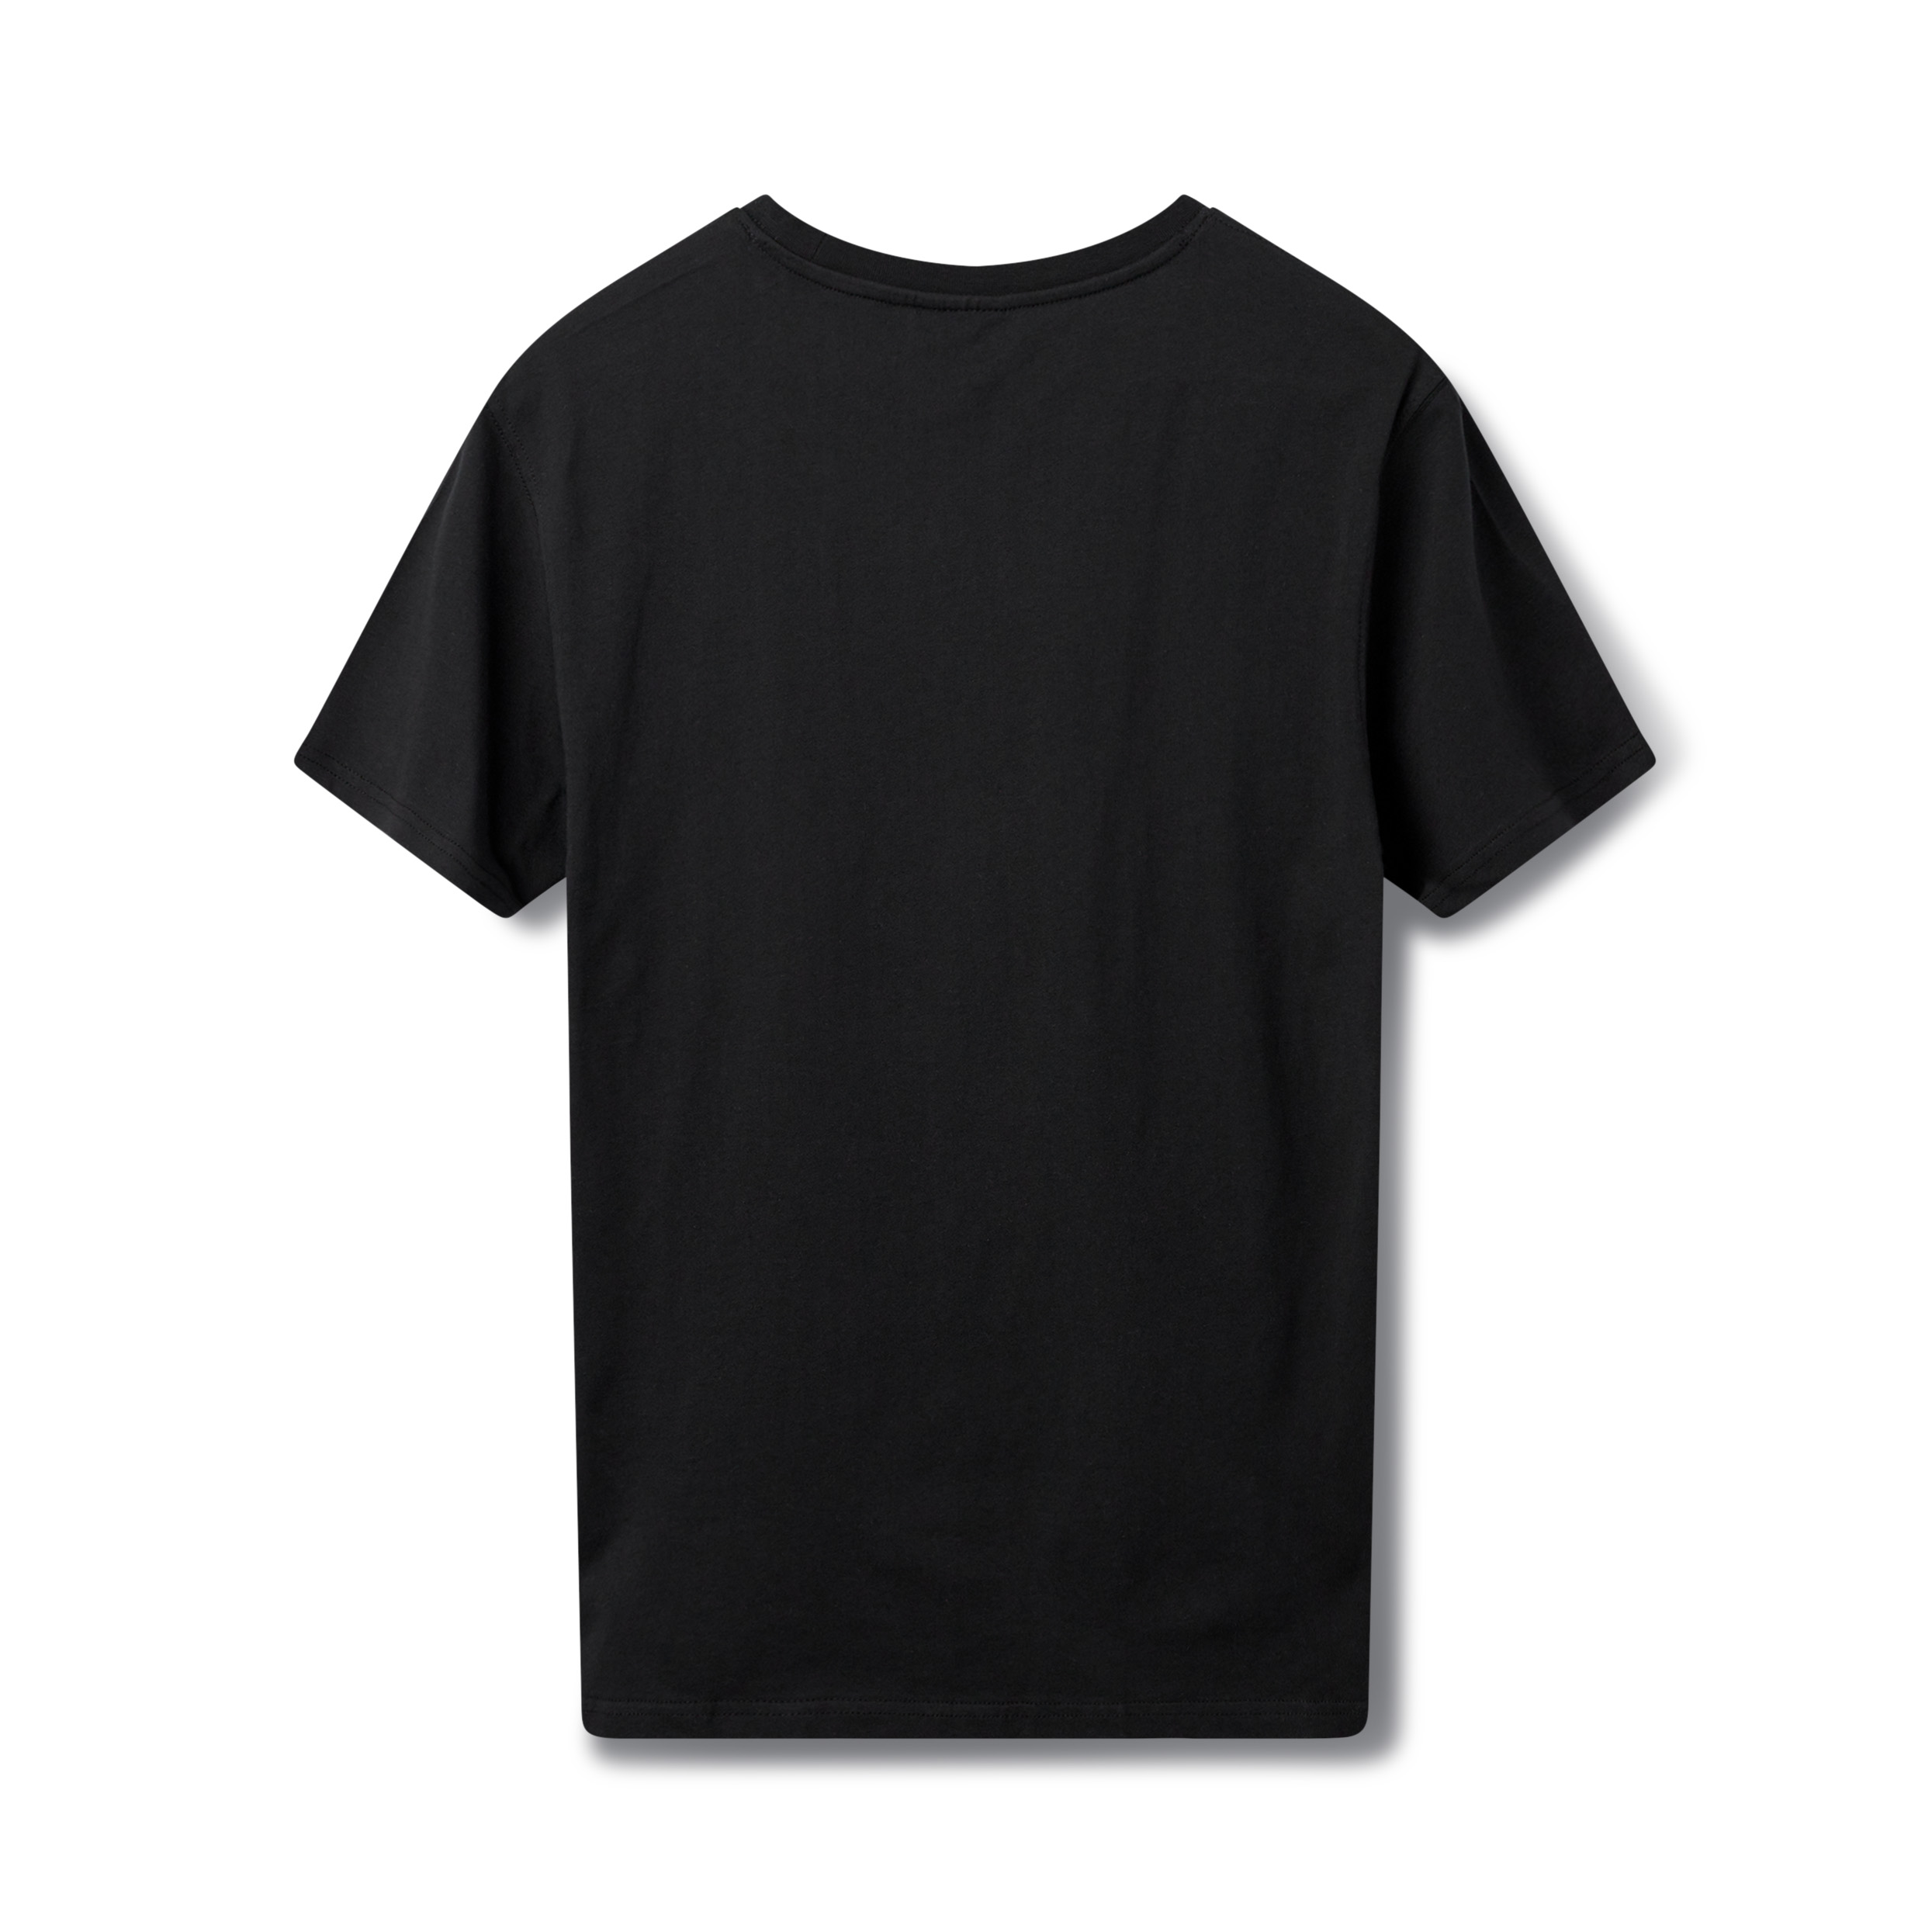 H2O Kilde t-shirt, black/purple, medium